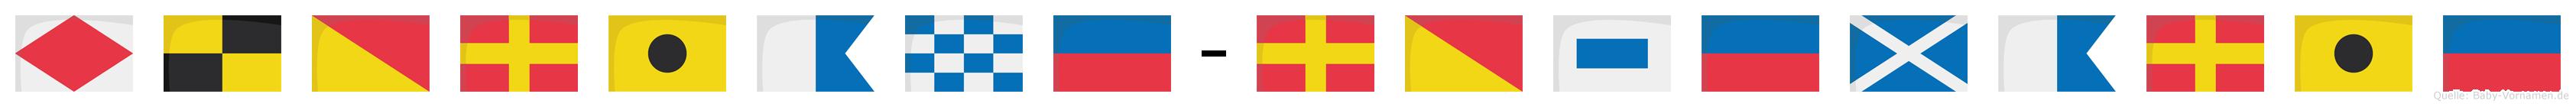 Floriane-Rosemarie im Flaggenalphabet